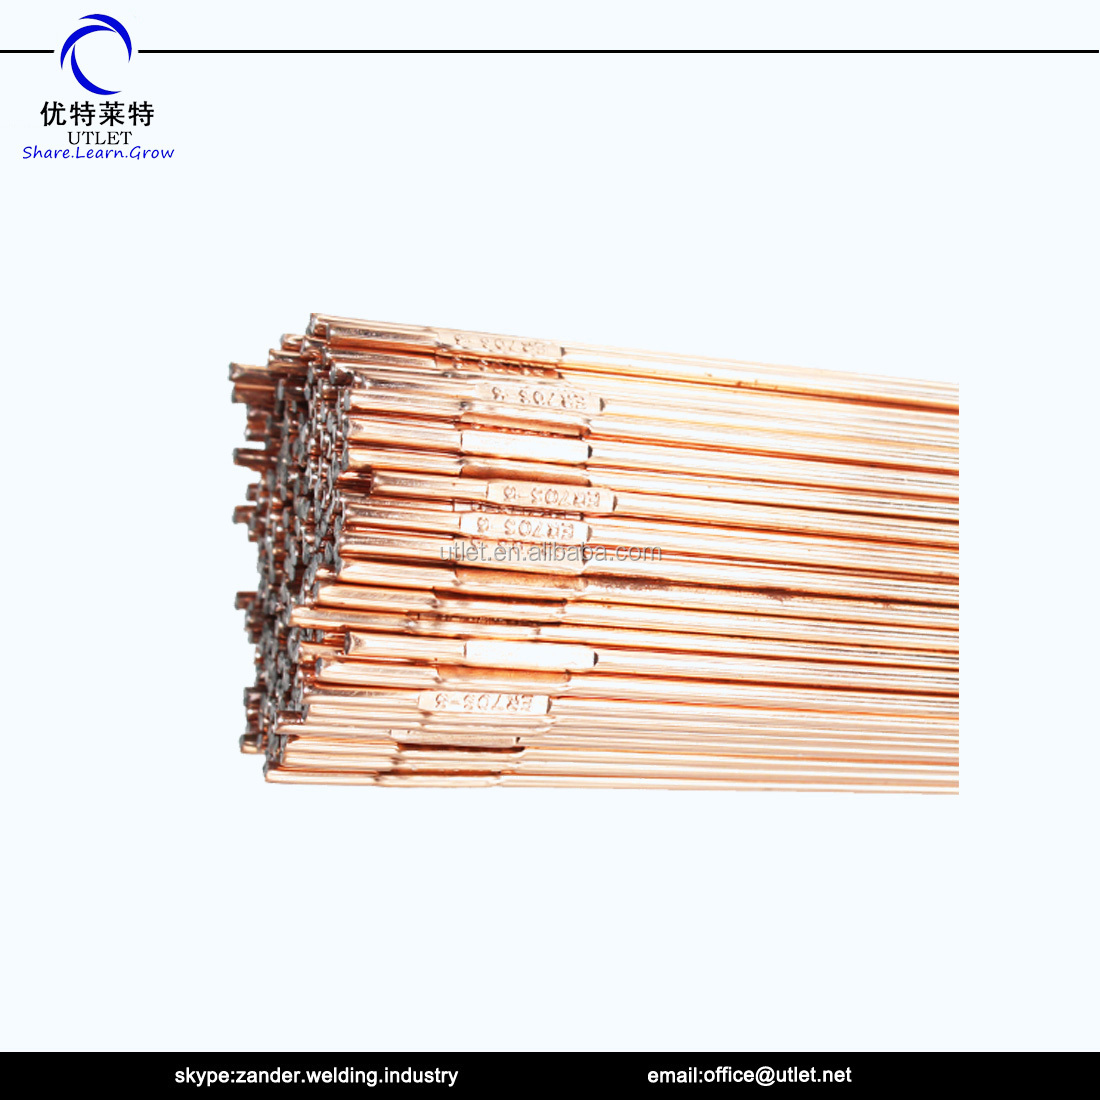 Welding Rods Copper Coated Mild Steel 3.2mm 1kg pack